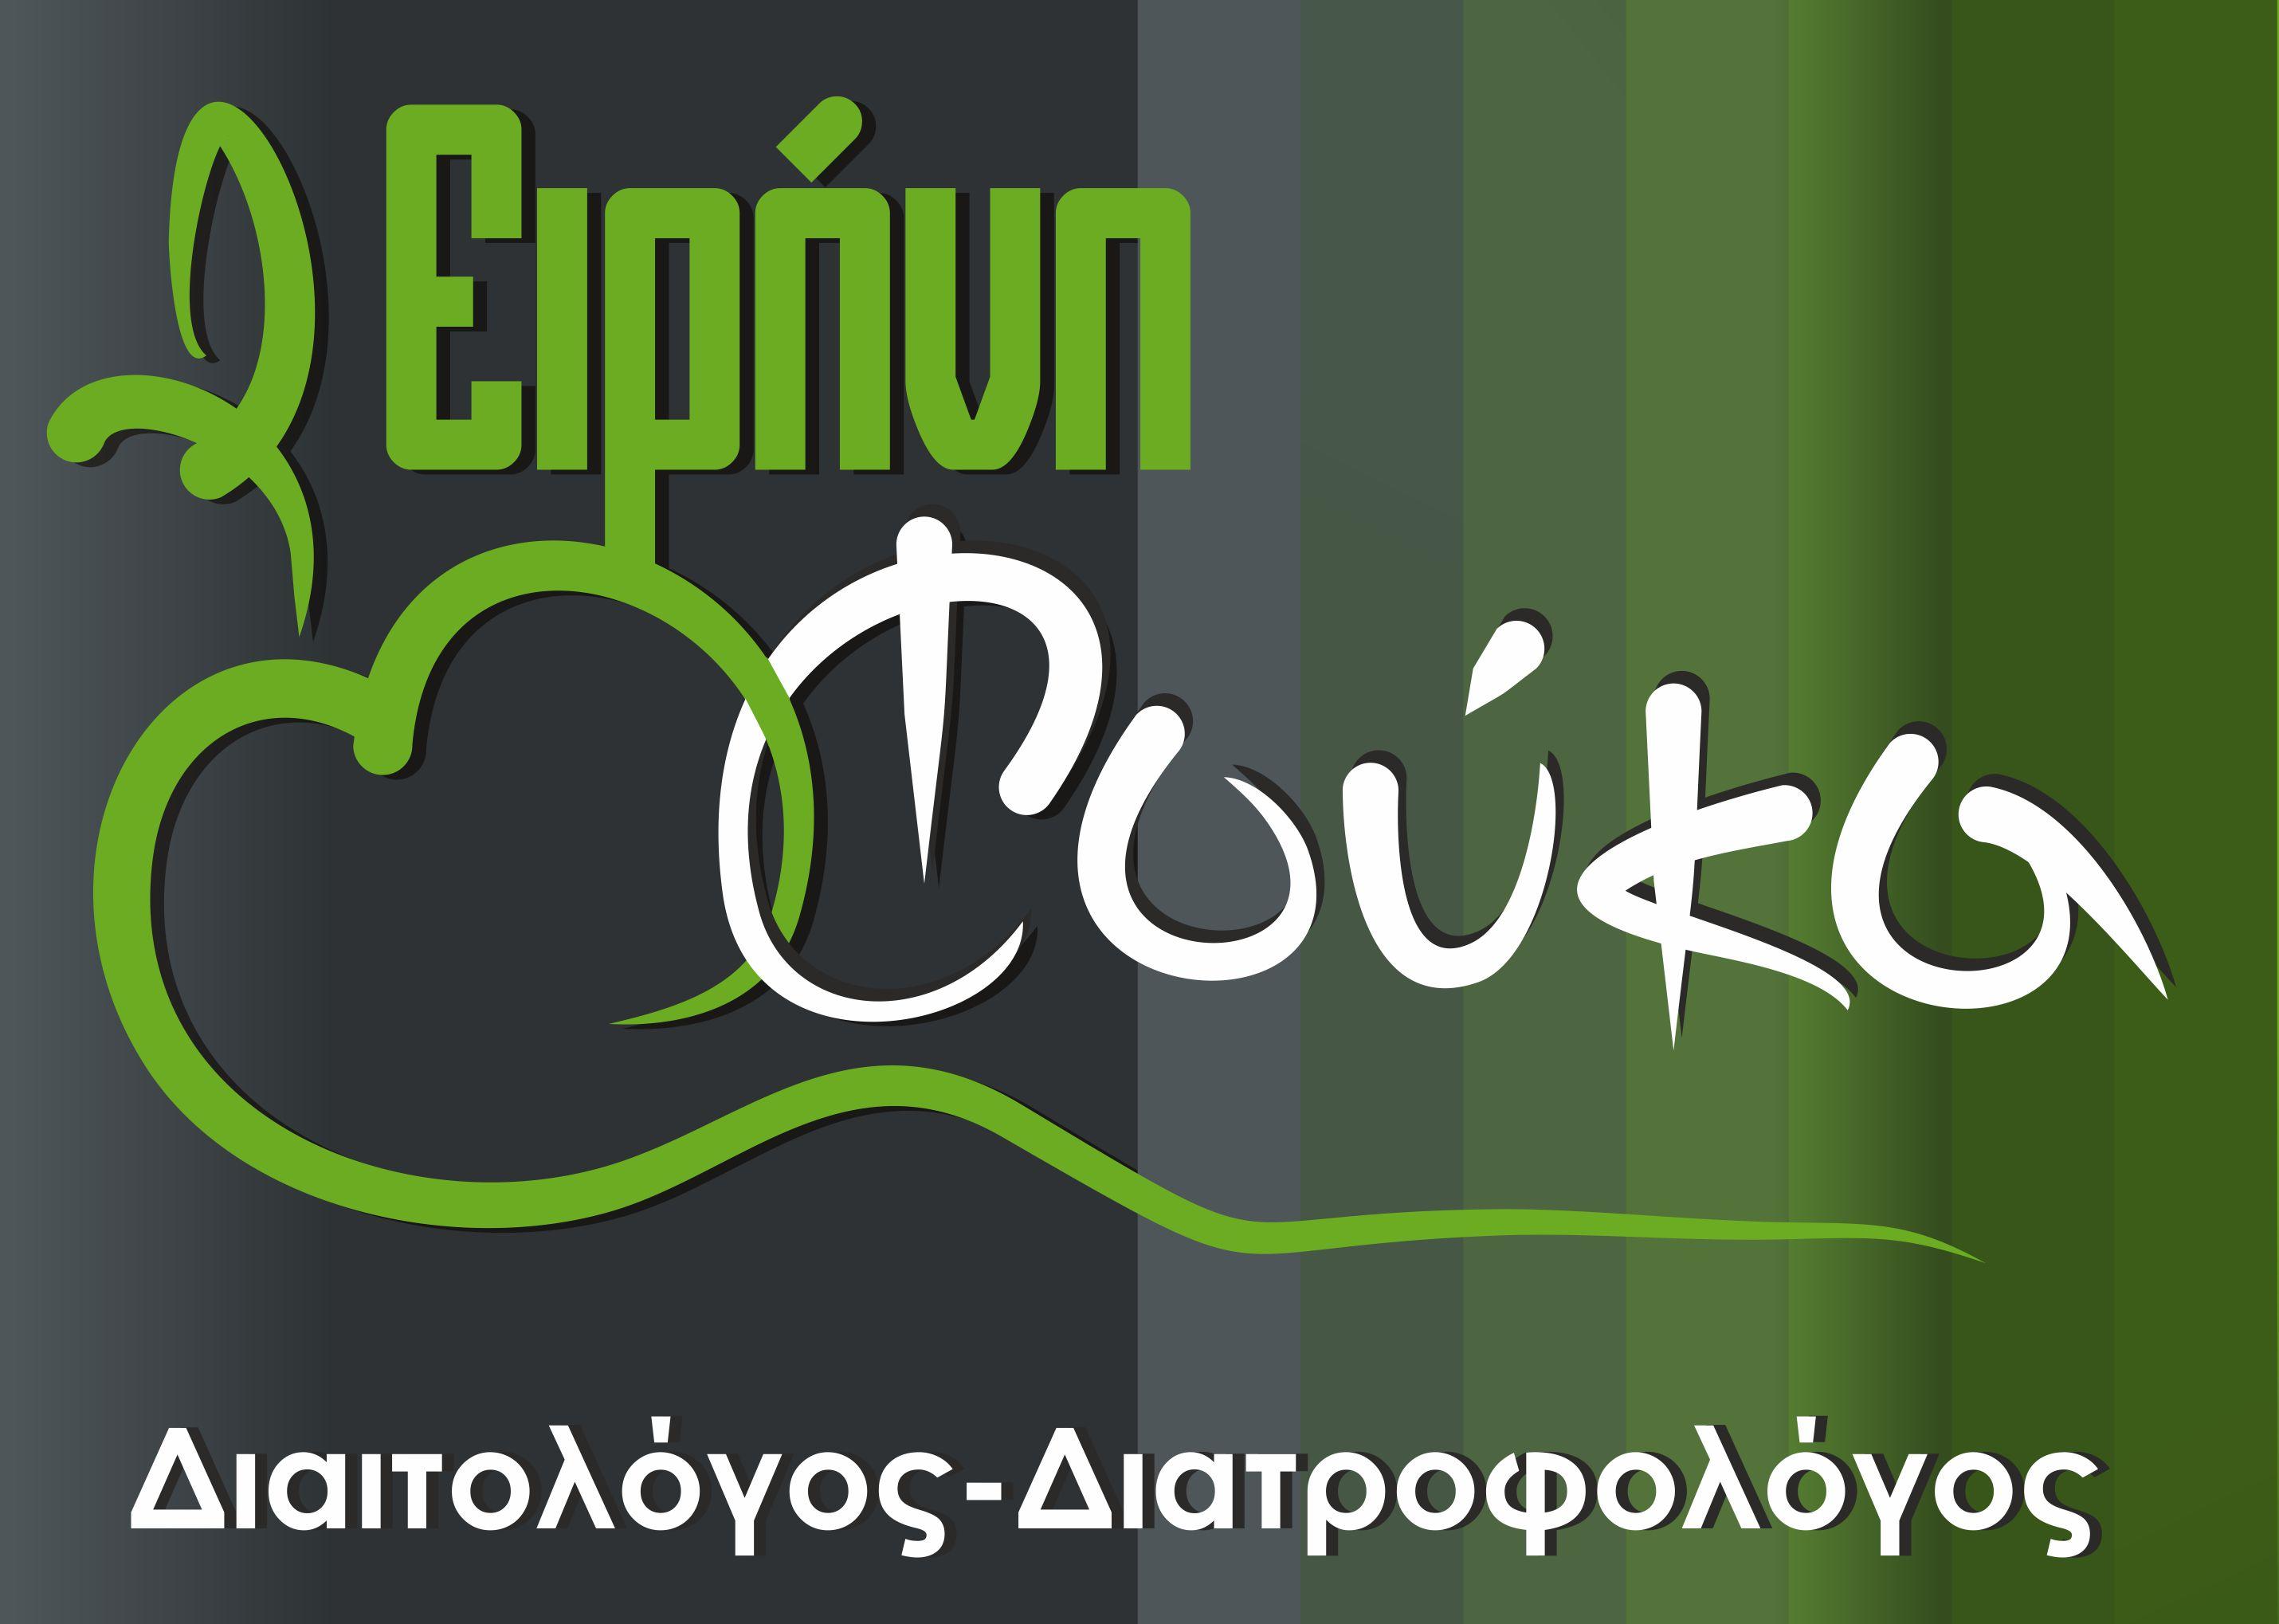 www.facebook.com/eirinifoukadiaitologos